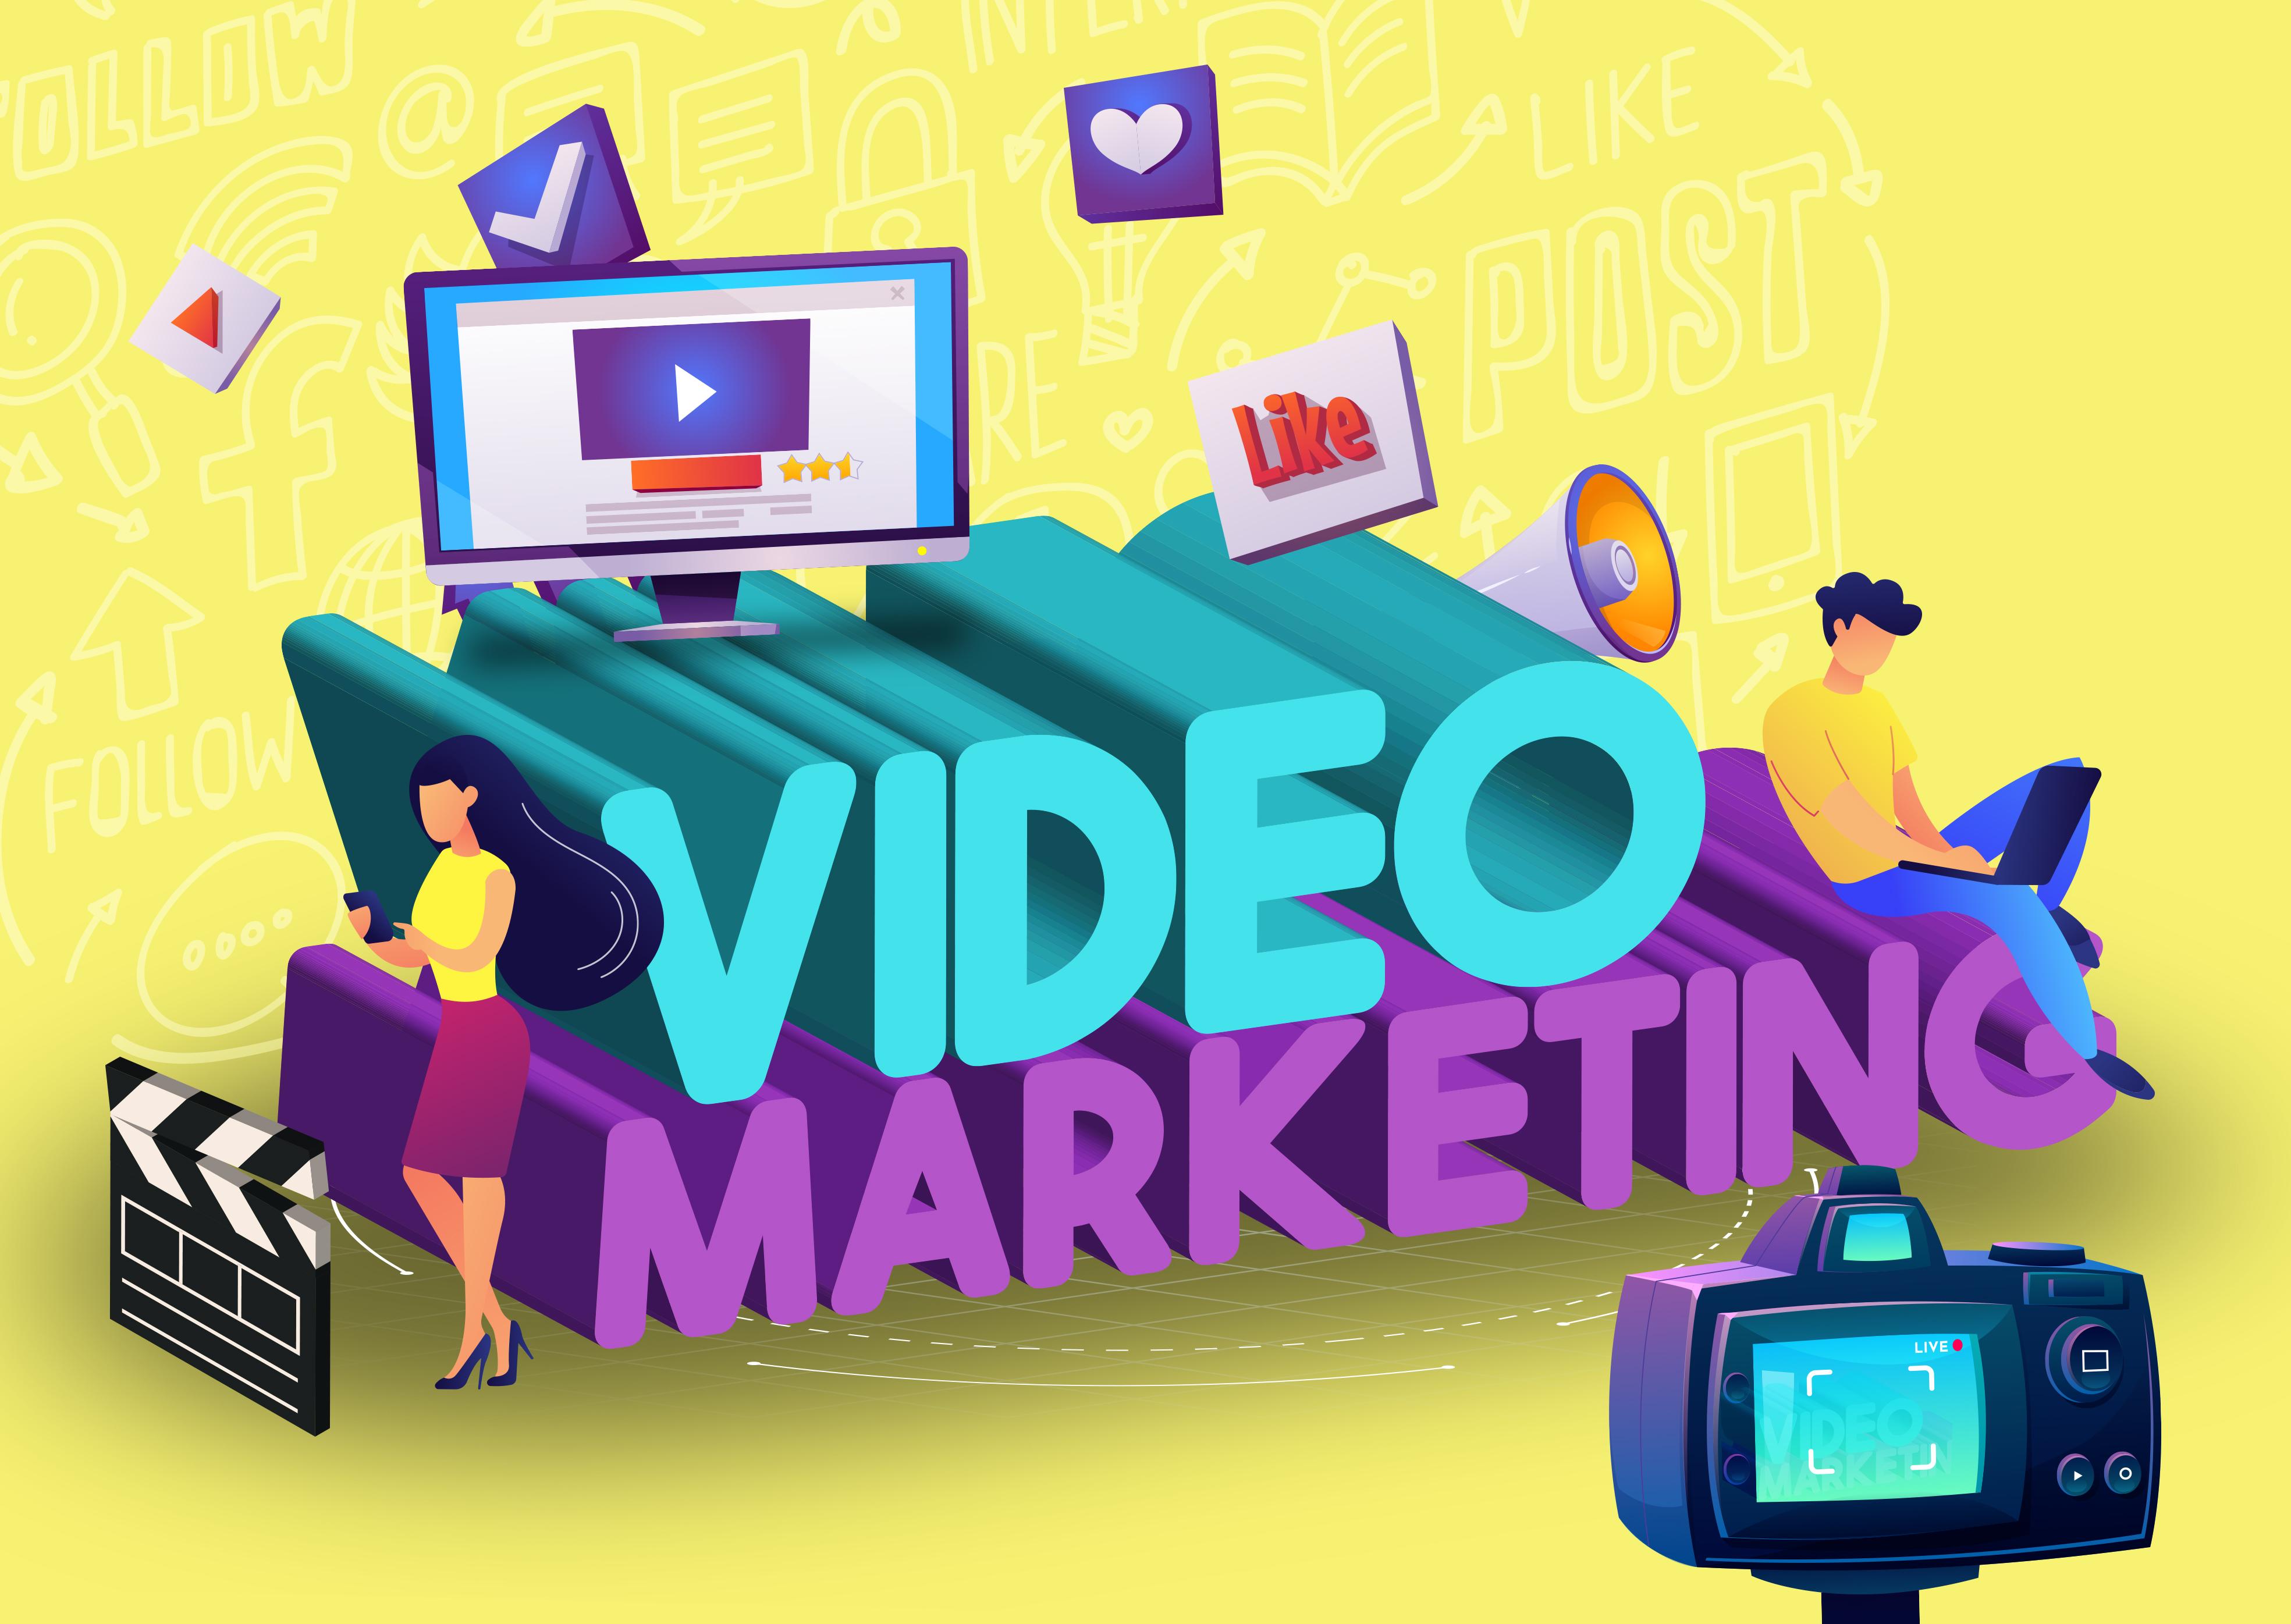 Video Marketing - YouTube, Instagram, Vlogging